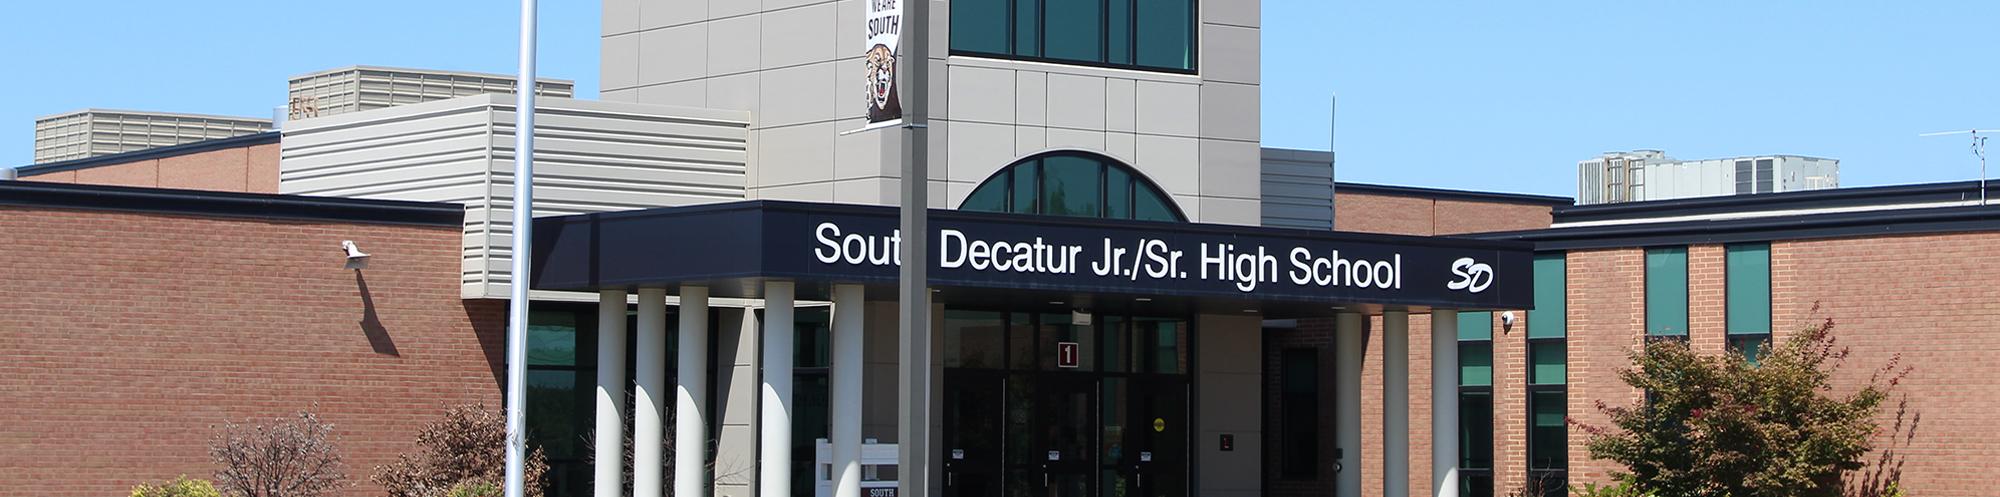 Front view of South Decatur Jr./Sr. High School